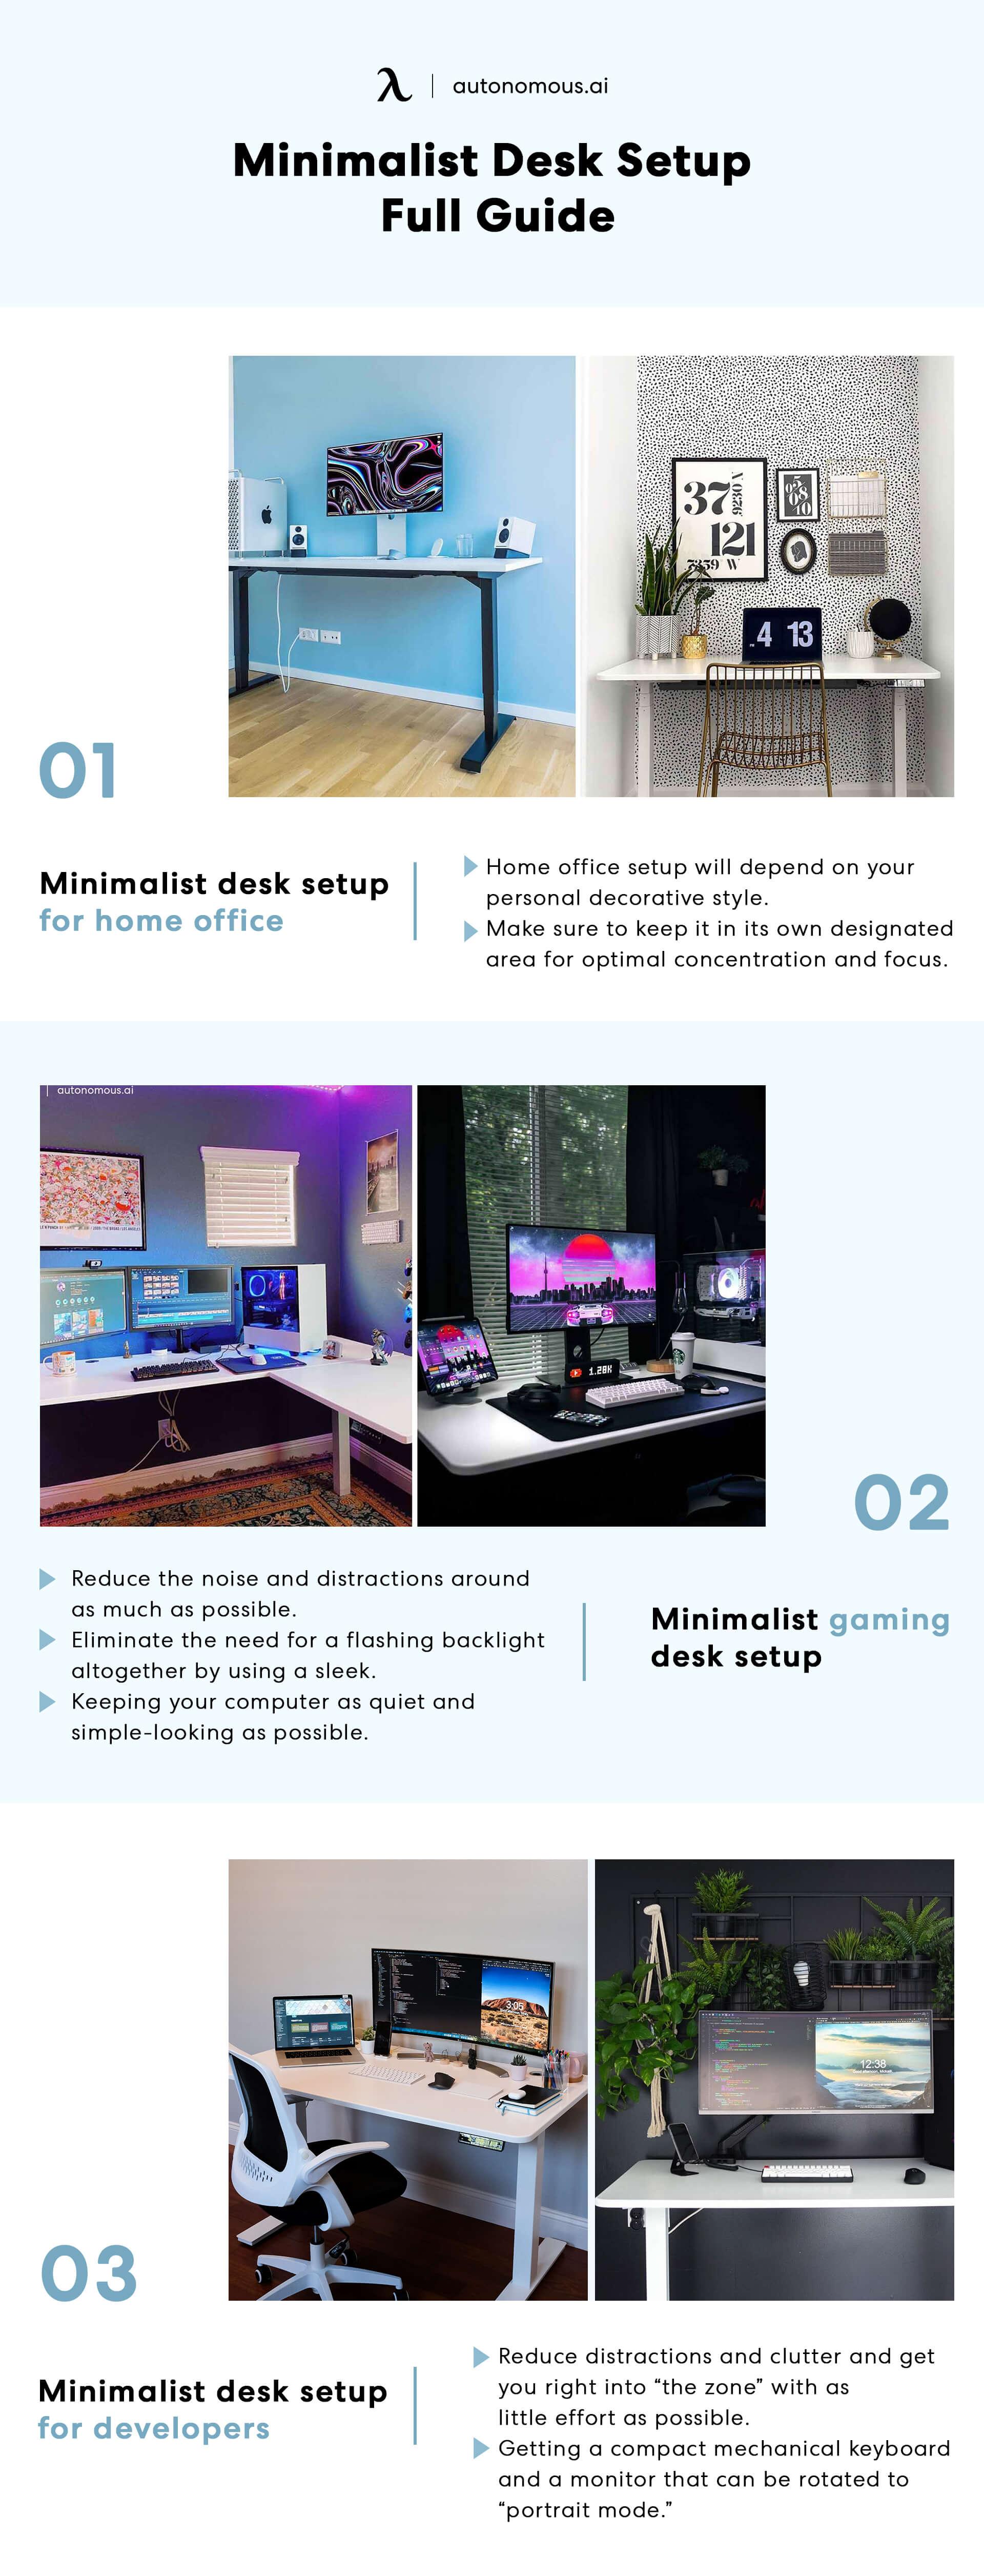 Minimalist Desk Setup Guide